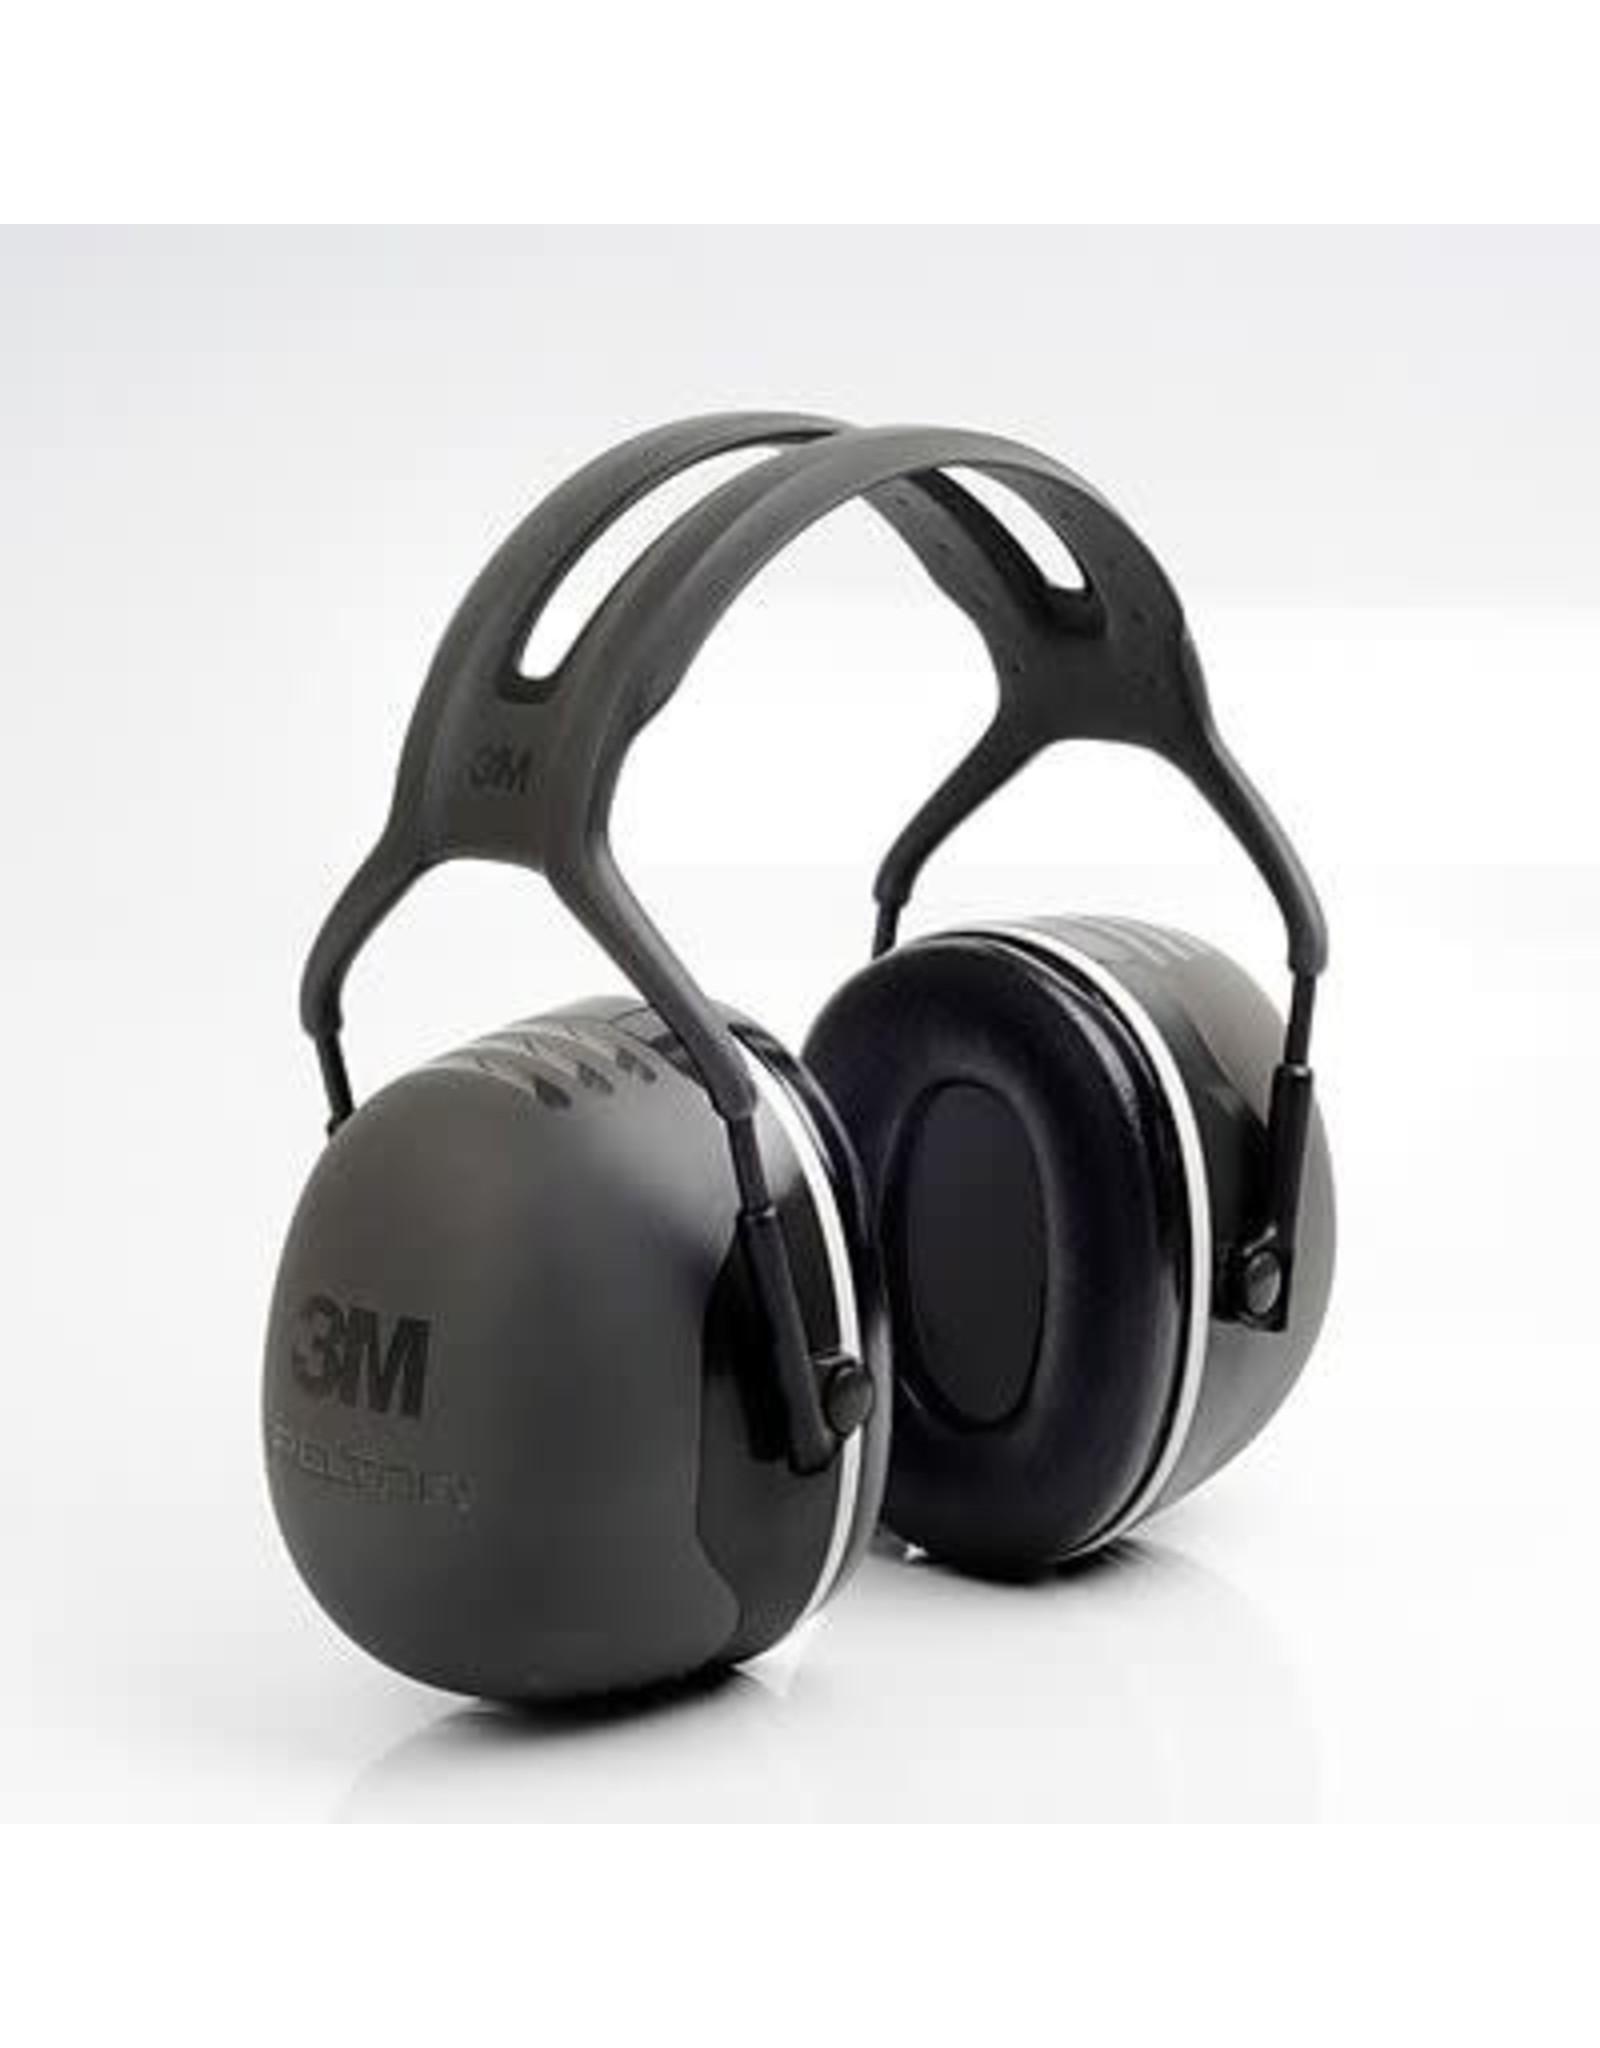 3M X5A Peltor Over-The-Head Earmuffs